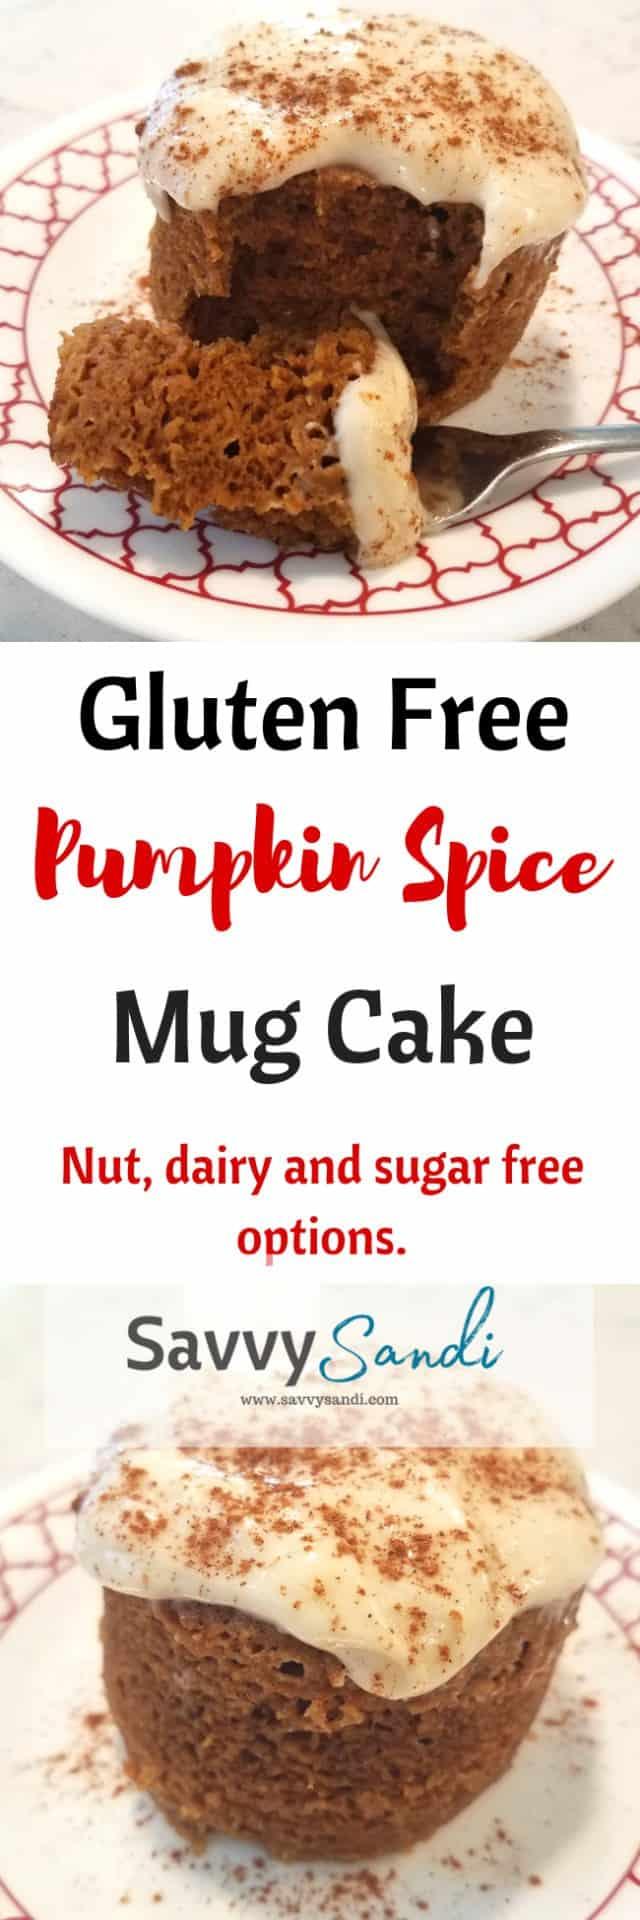 Gluten Free Nut Free Pumpkin Spice Mug